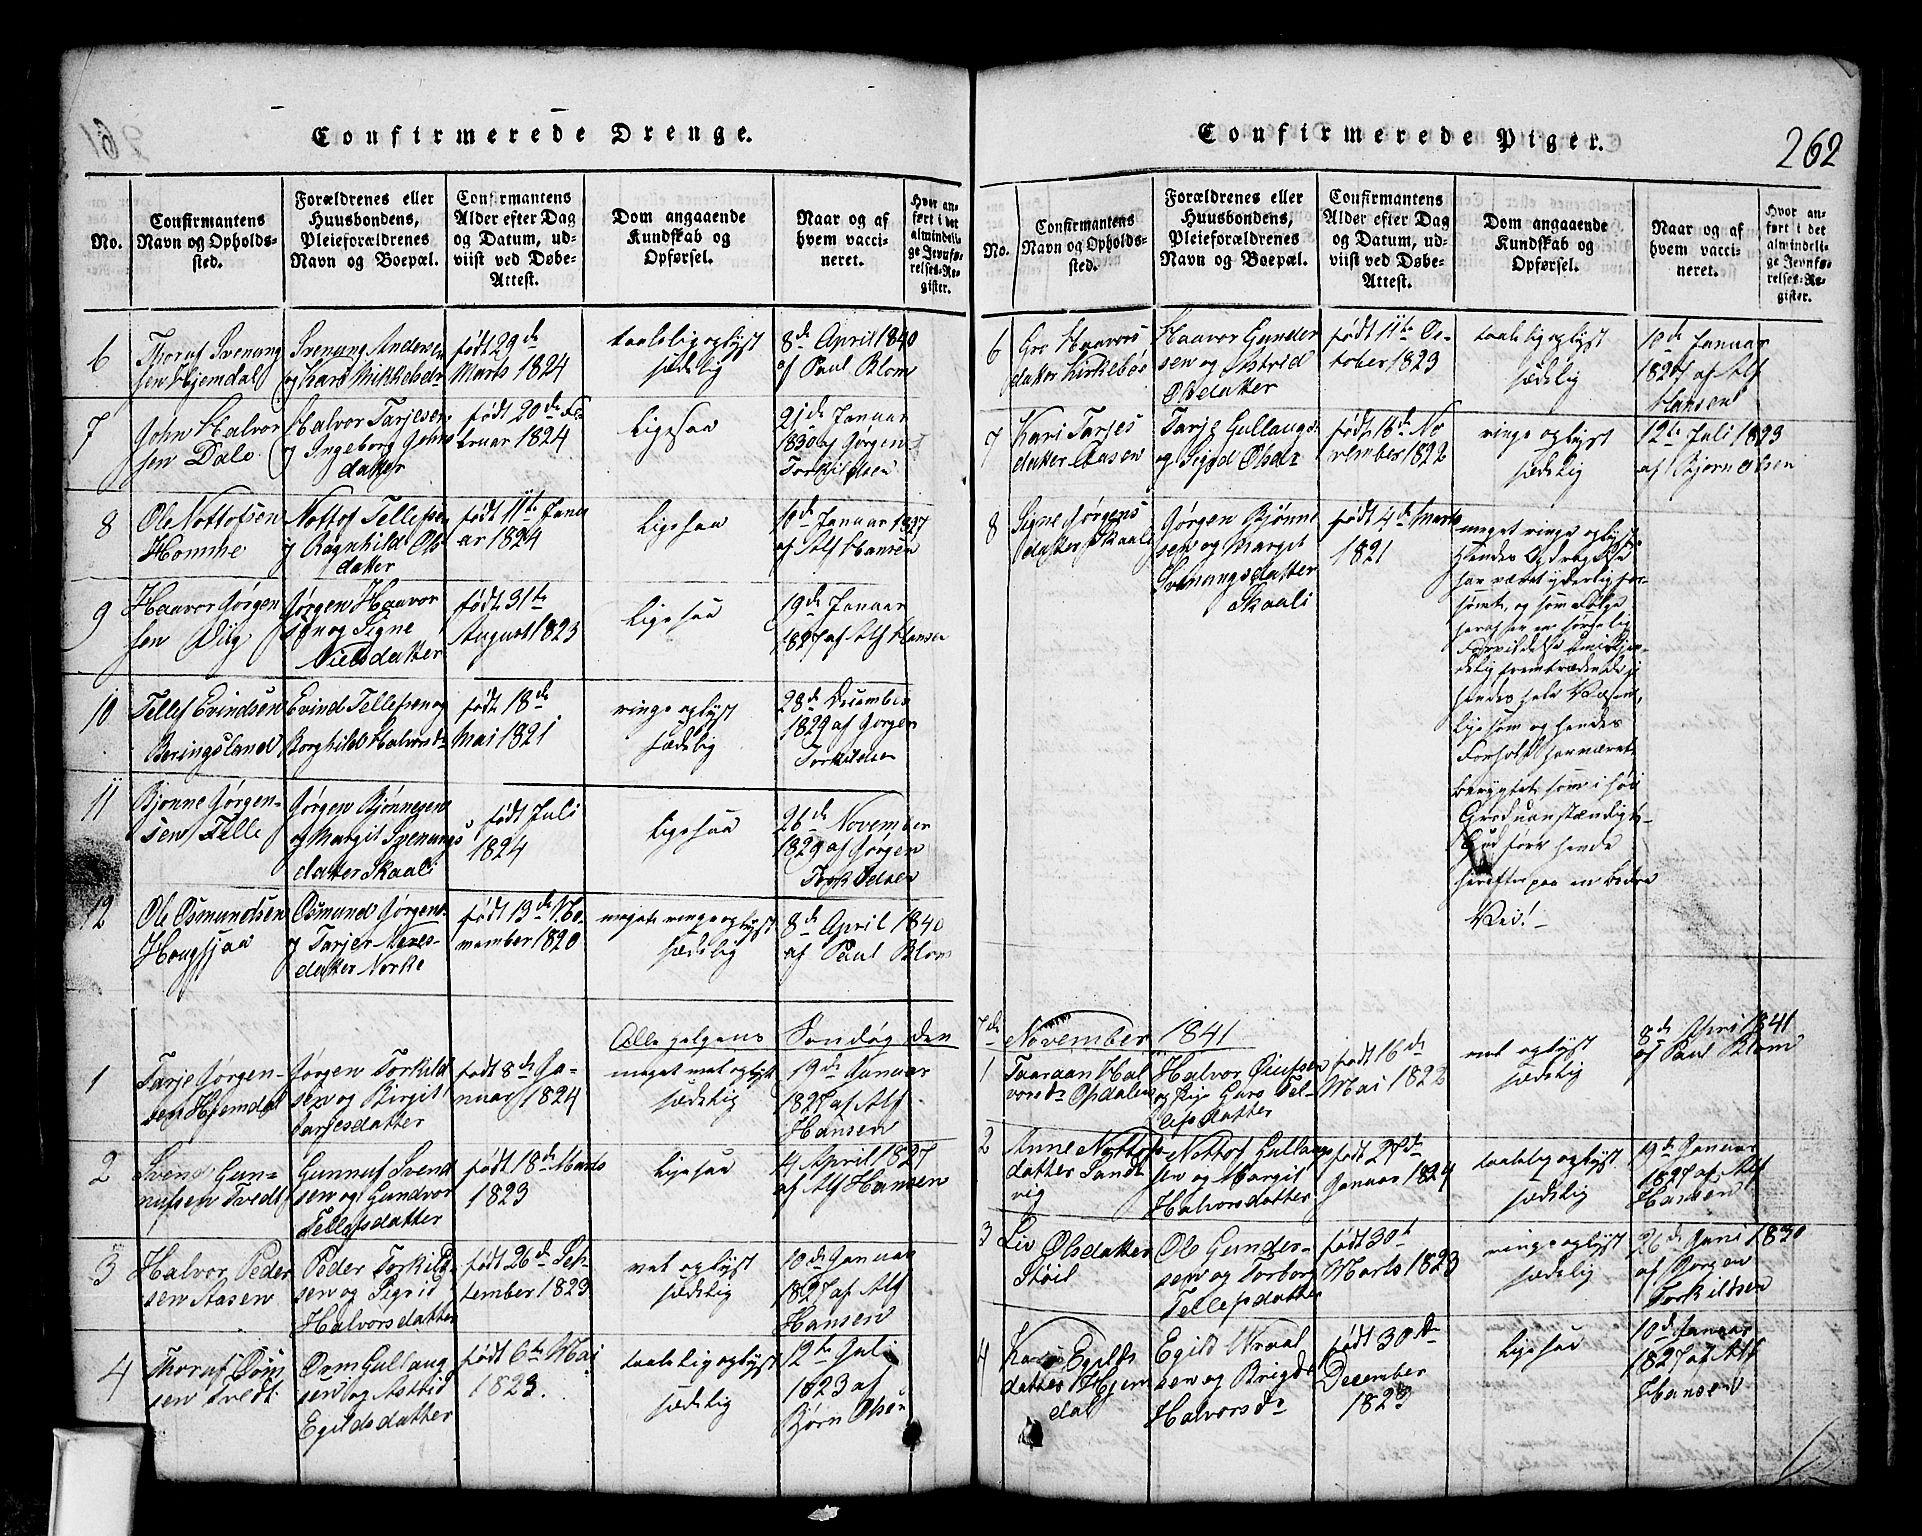 SAKO, Nissedal kirkebøker, G/Gb/L0001: Klokkerbok nr. II 1, 1814-1862, s. 262